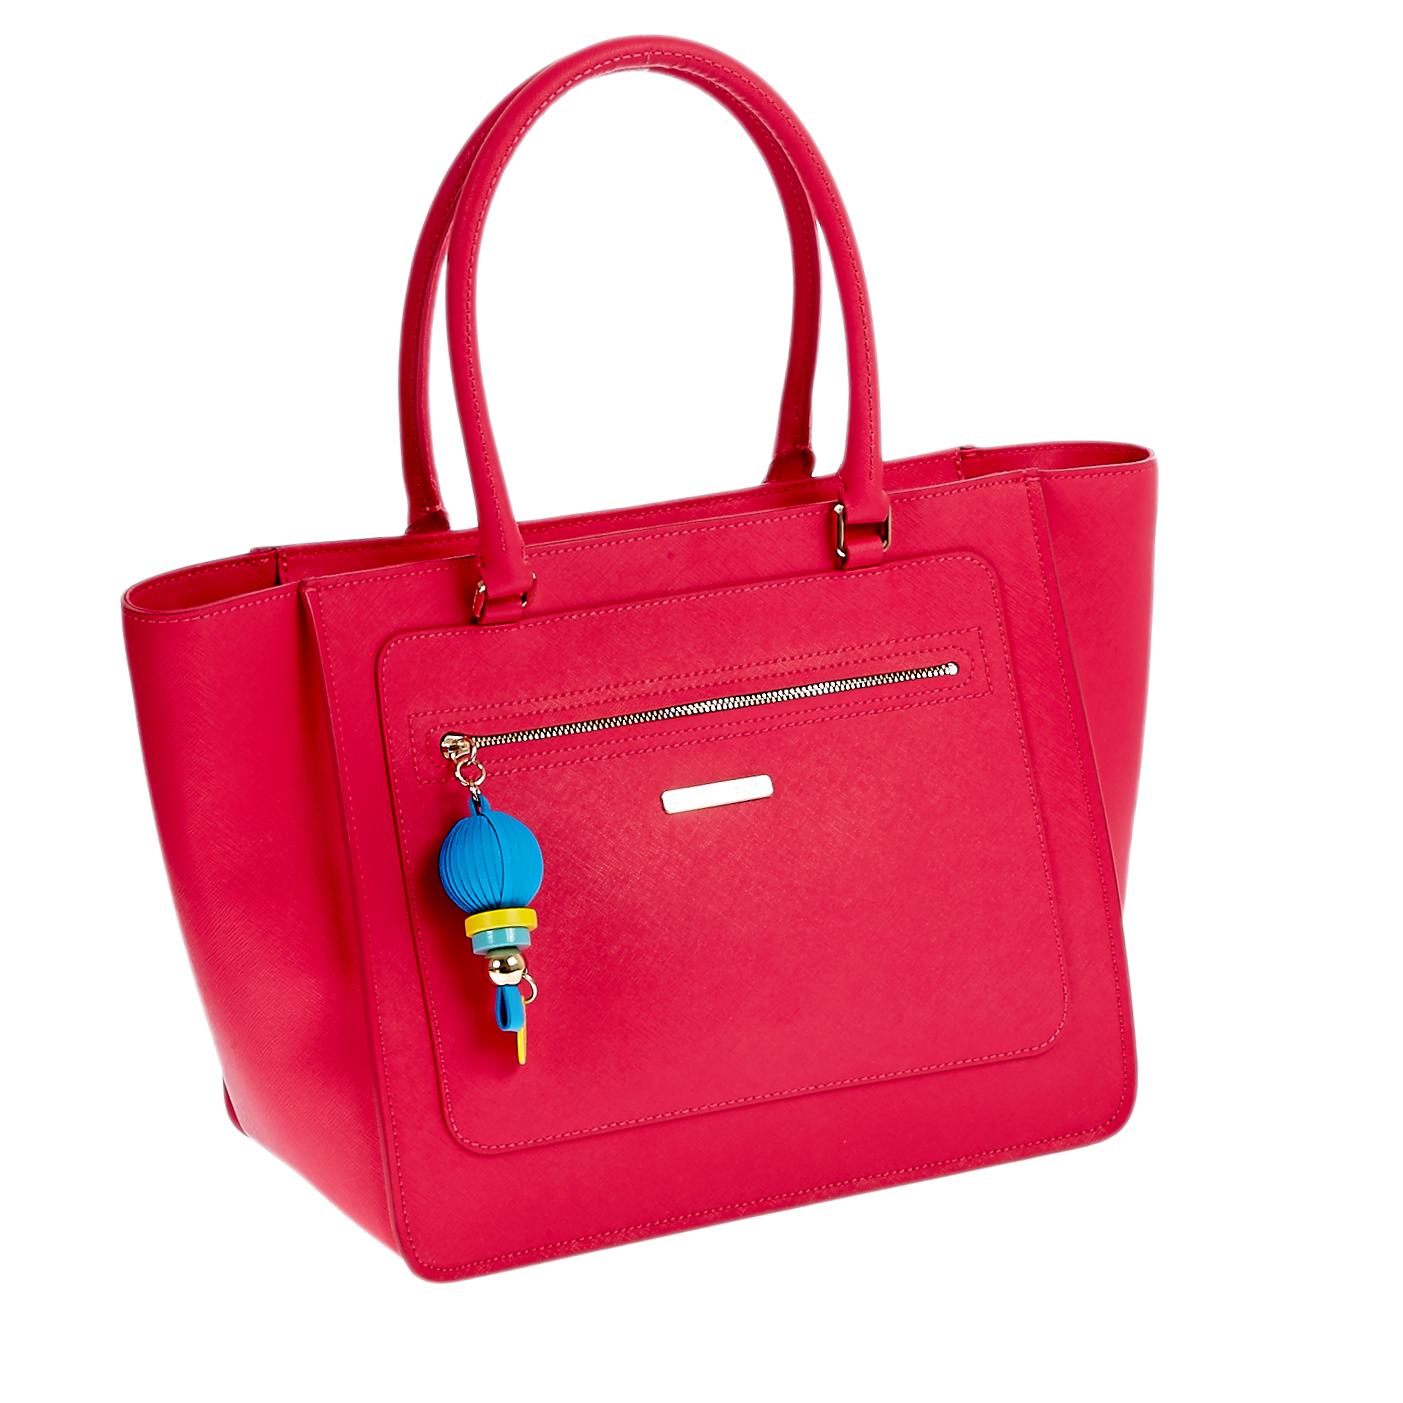 7932d9275c JUICY COUTURE - Γυναικεία τσάντα Juicy Couture κόκκινη-φούξια